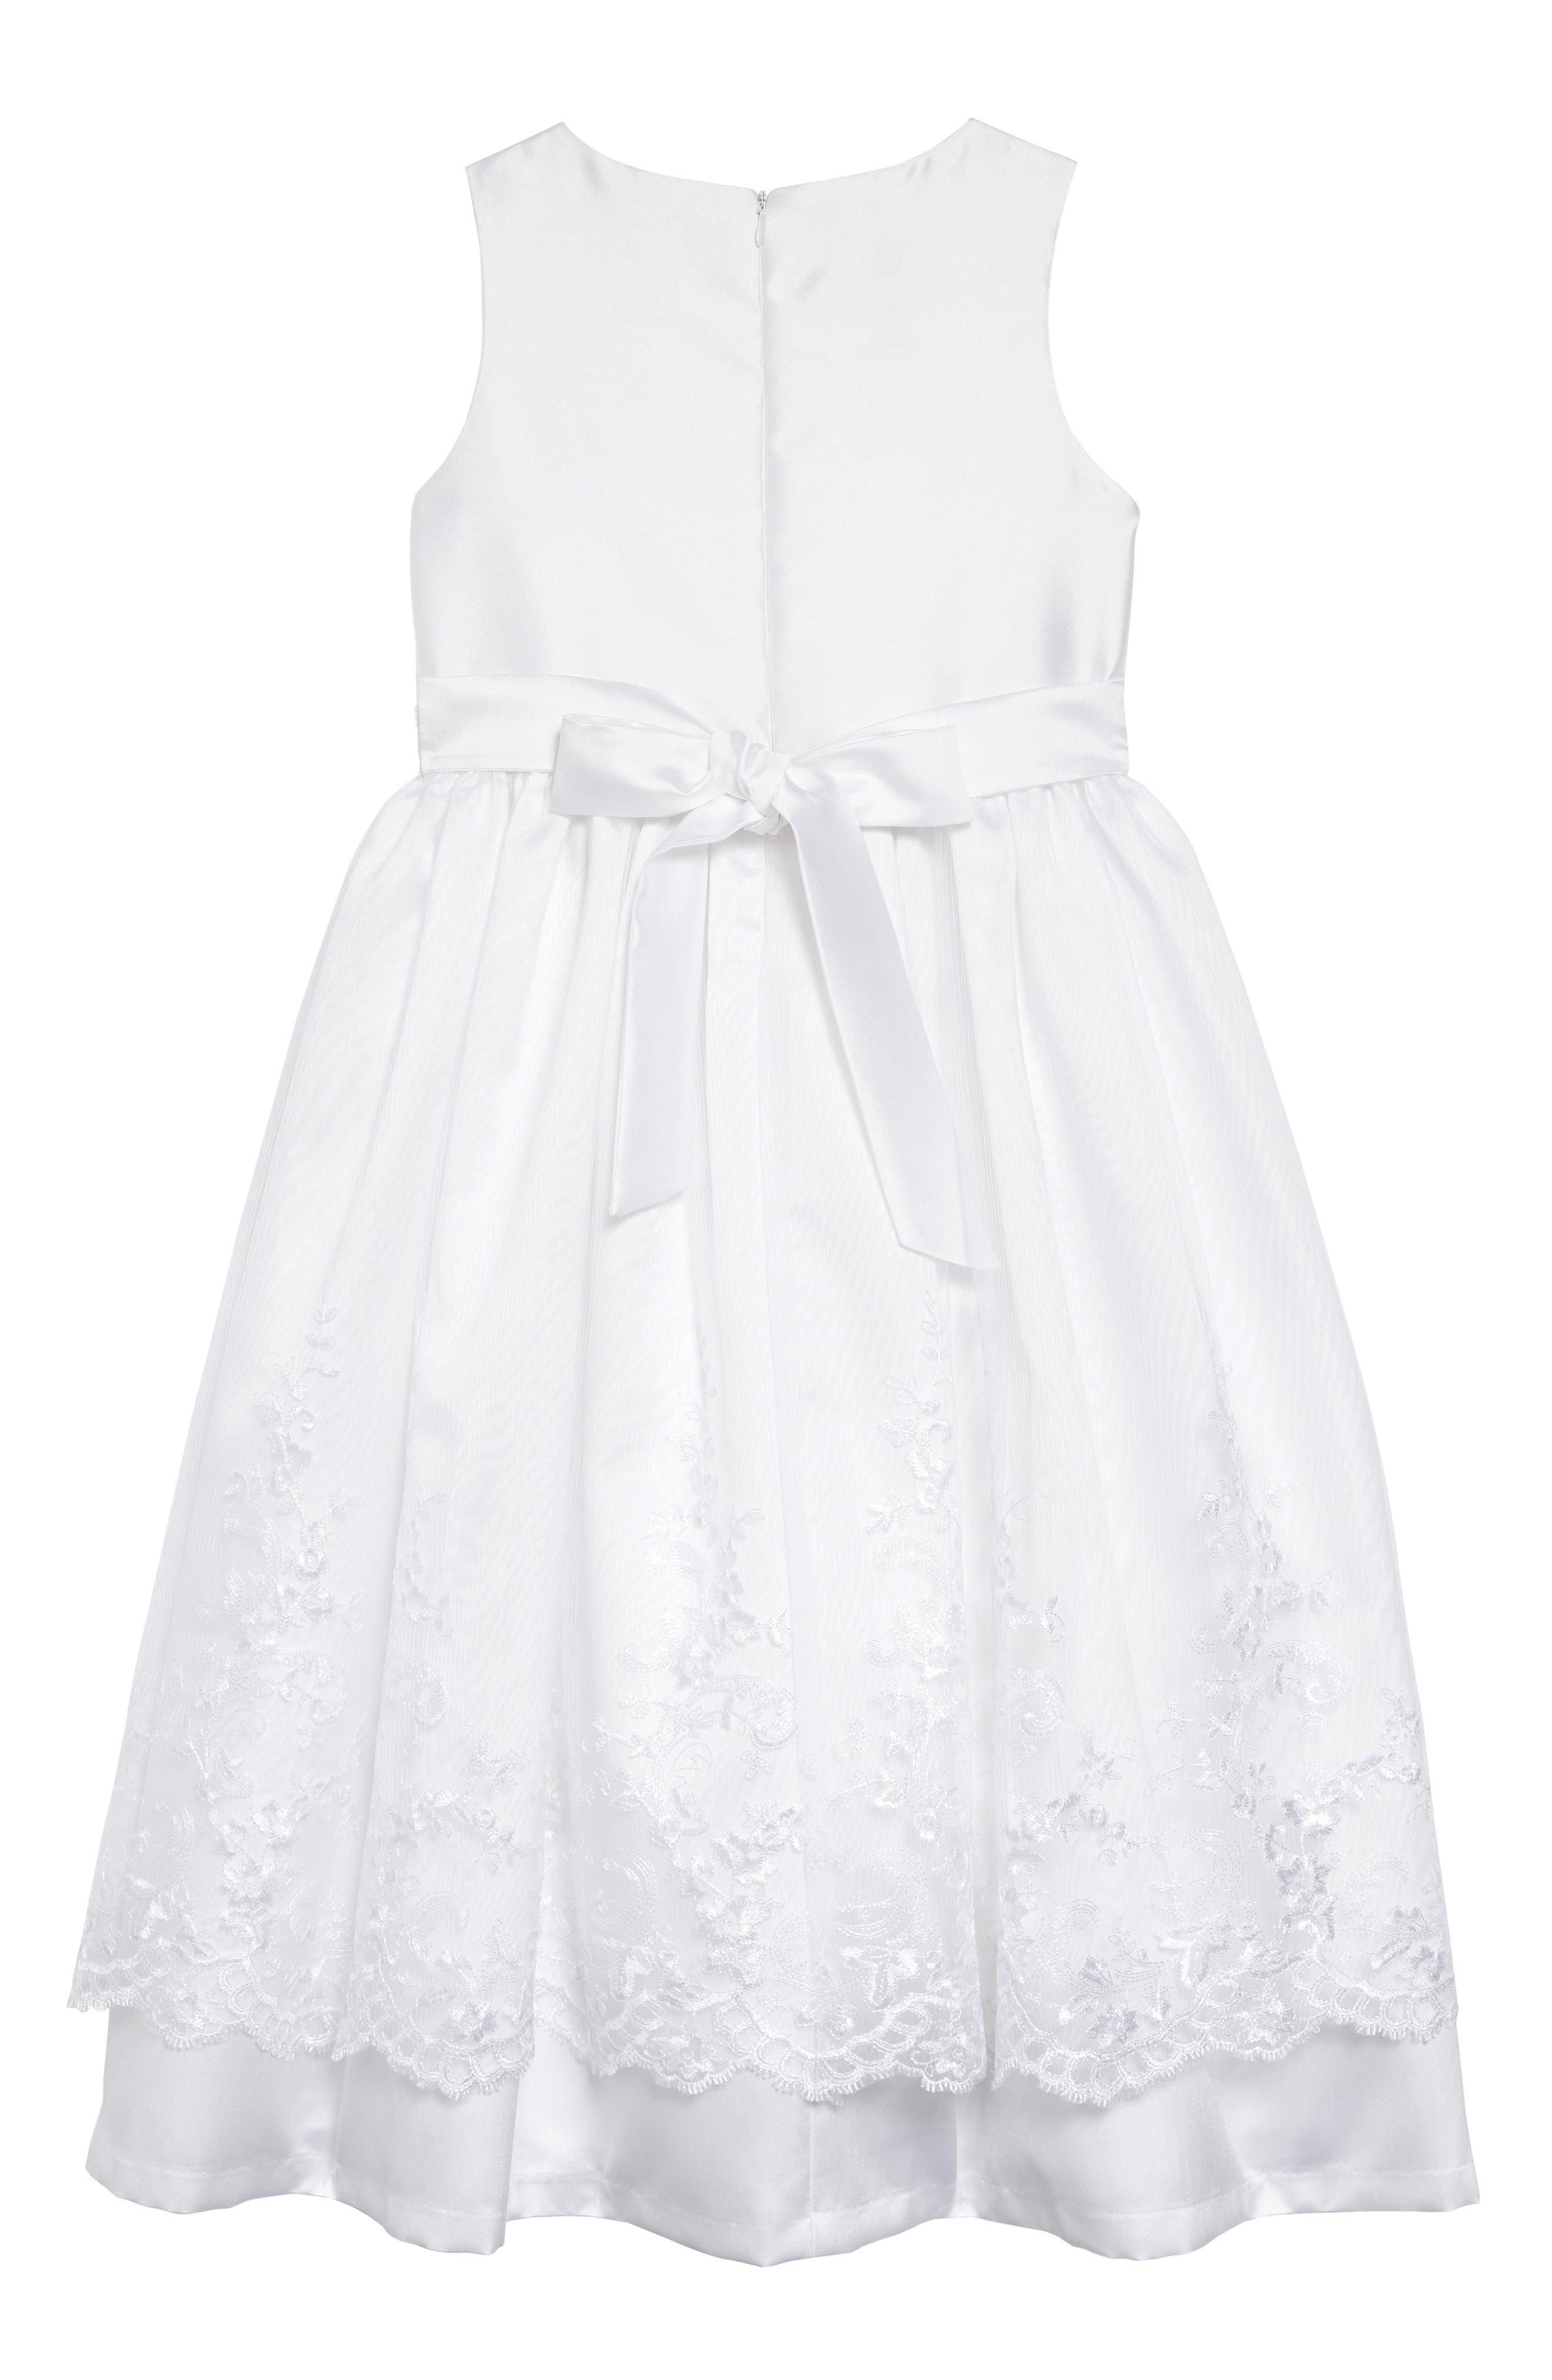 IRIS & IVY, Sweetheart Fit & Flare Mikado Dress & Jacket Set, Alternate thumbnail 3, color, WHITE